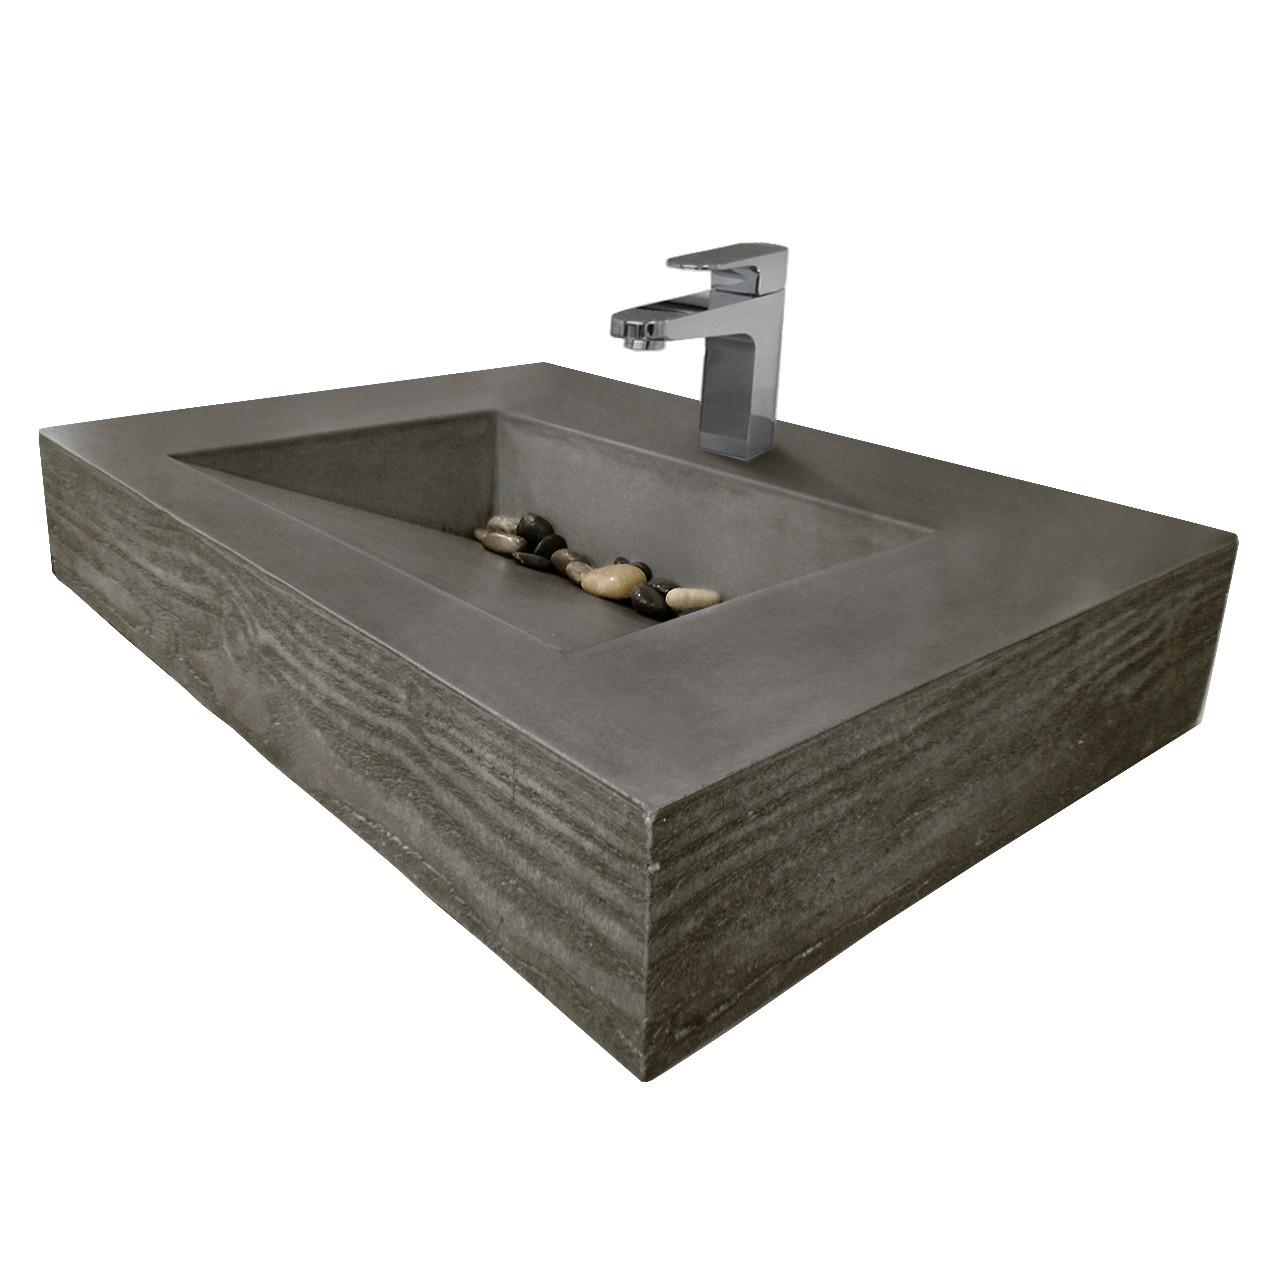 Trueform 30 ADA Floating Concrete Bathroom Sink Wood Edge Designed For A Restaurant Bar